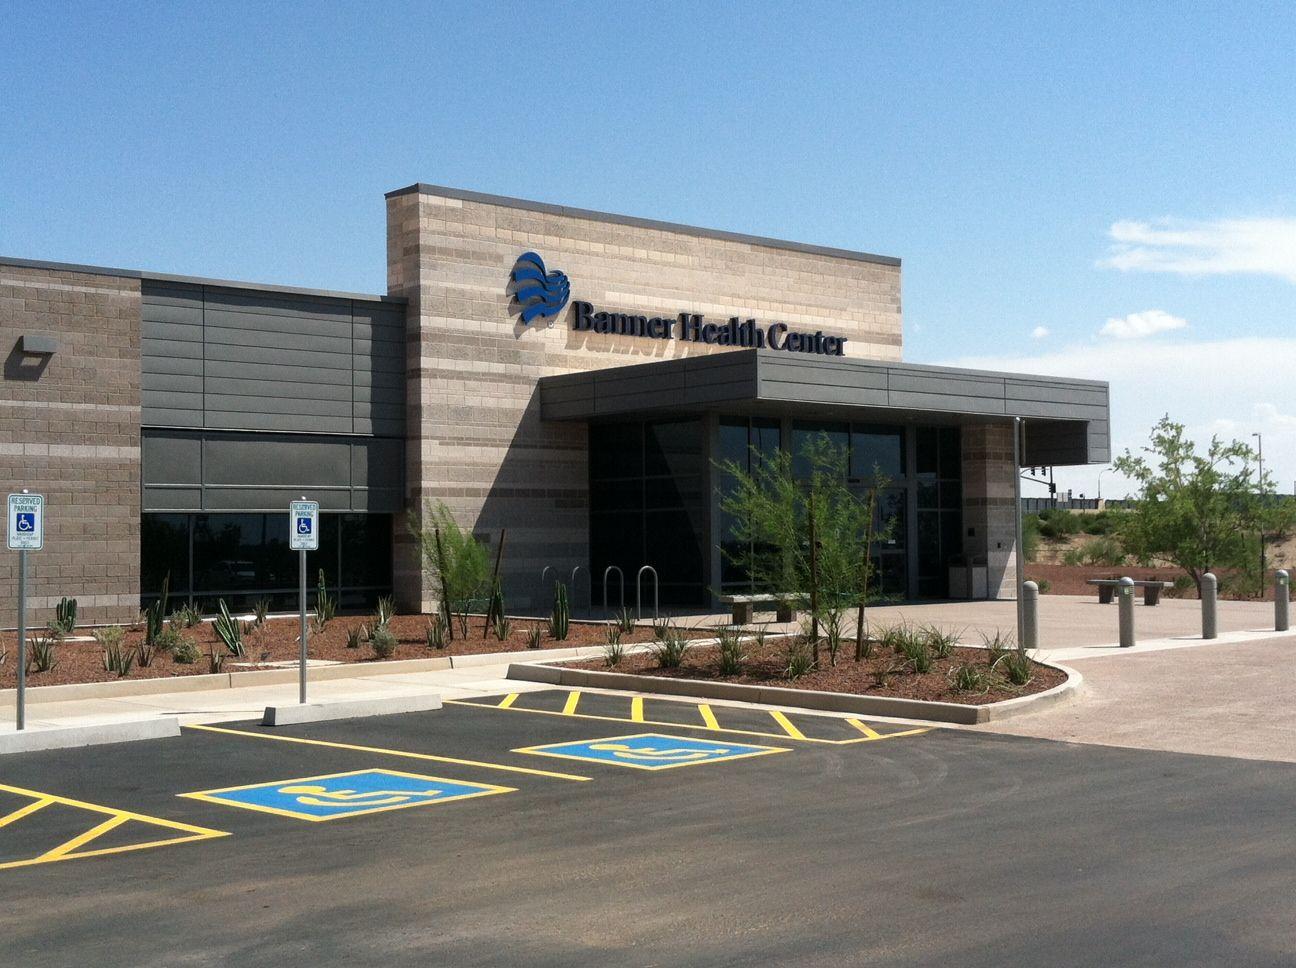 Banner Health Center Health center, Health, Primary care